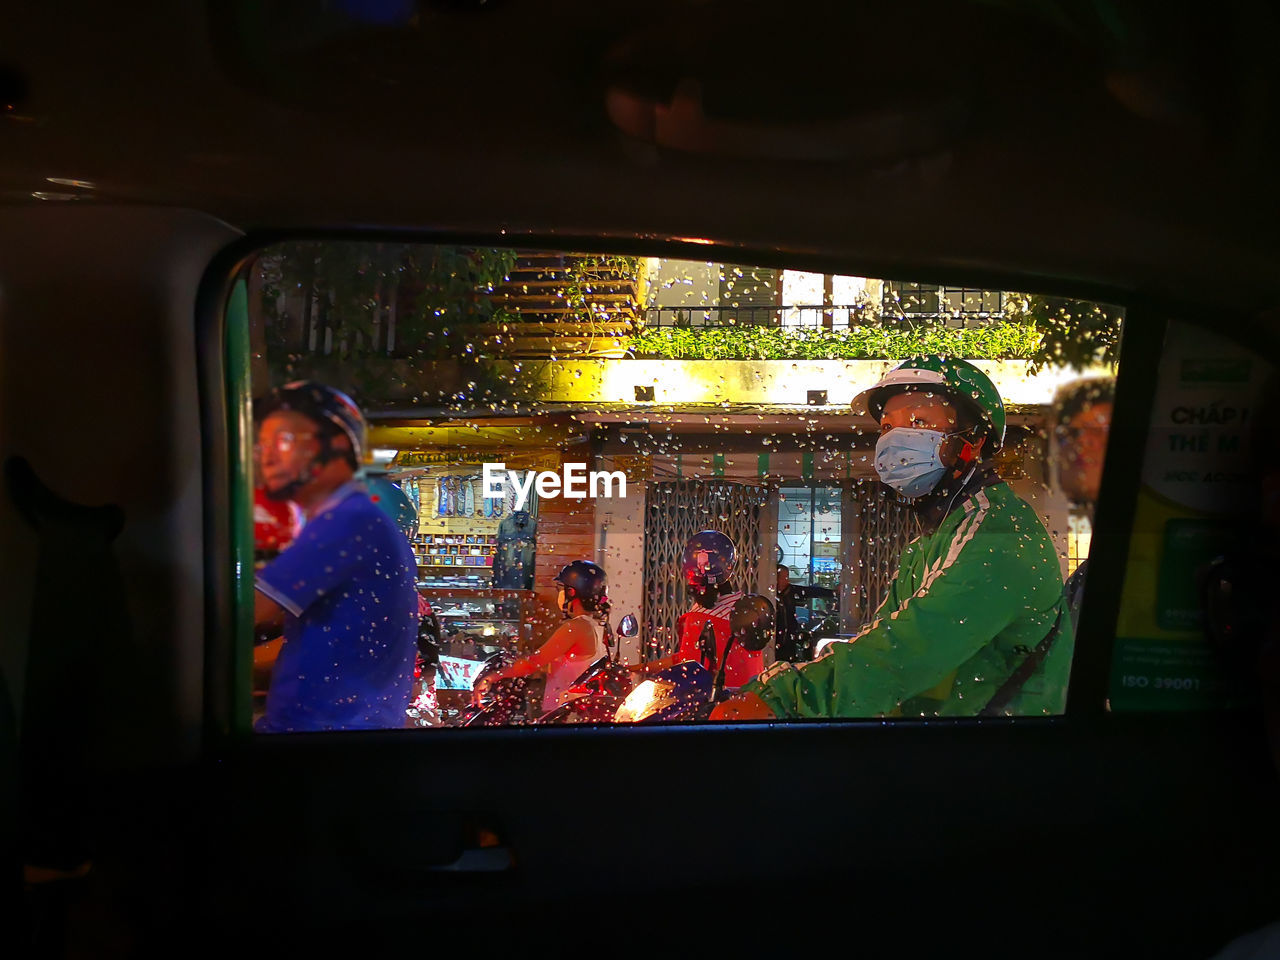 window, real people, night, looking through window, illuminated, lifestyles, indoors, men, togetherness, sitting, childhood, women, people